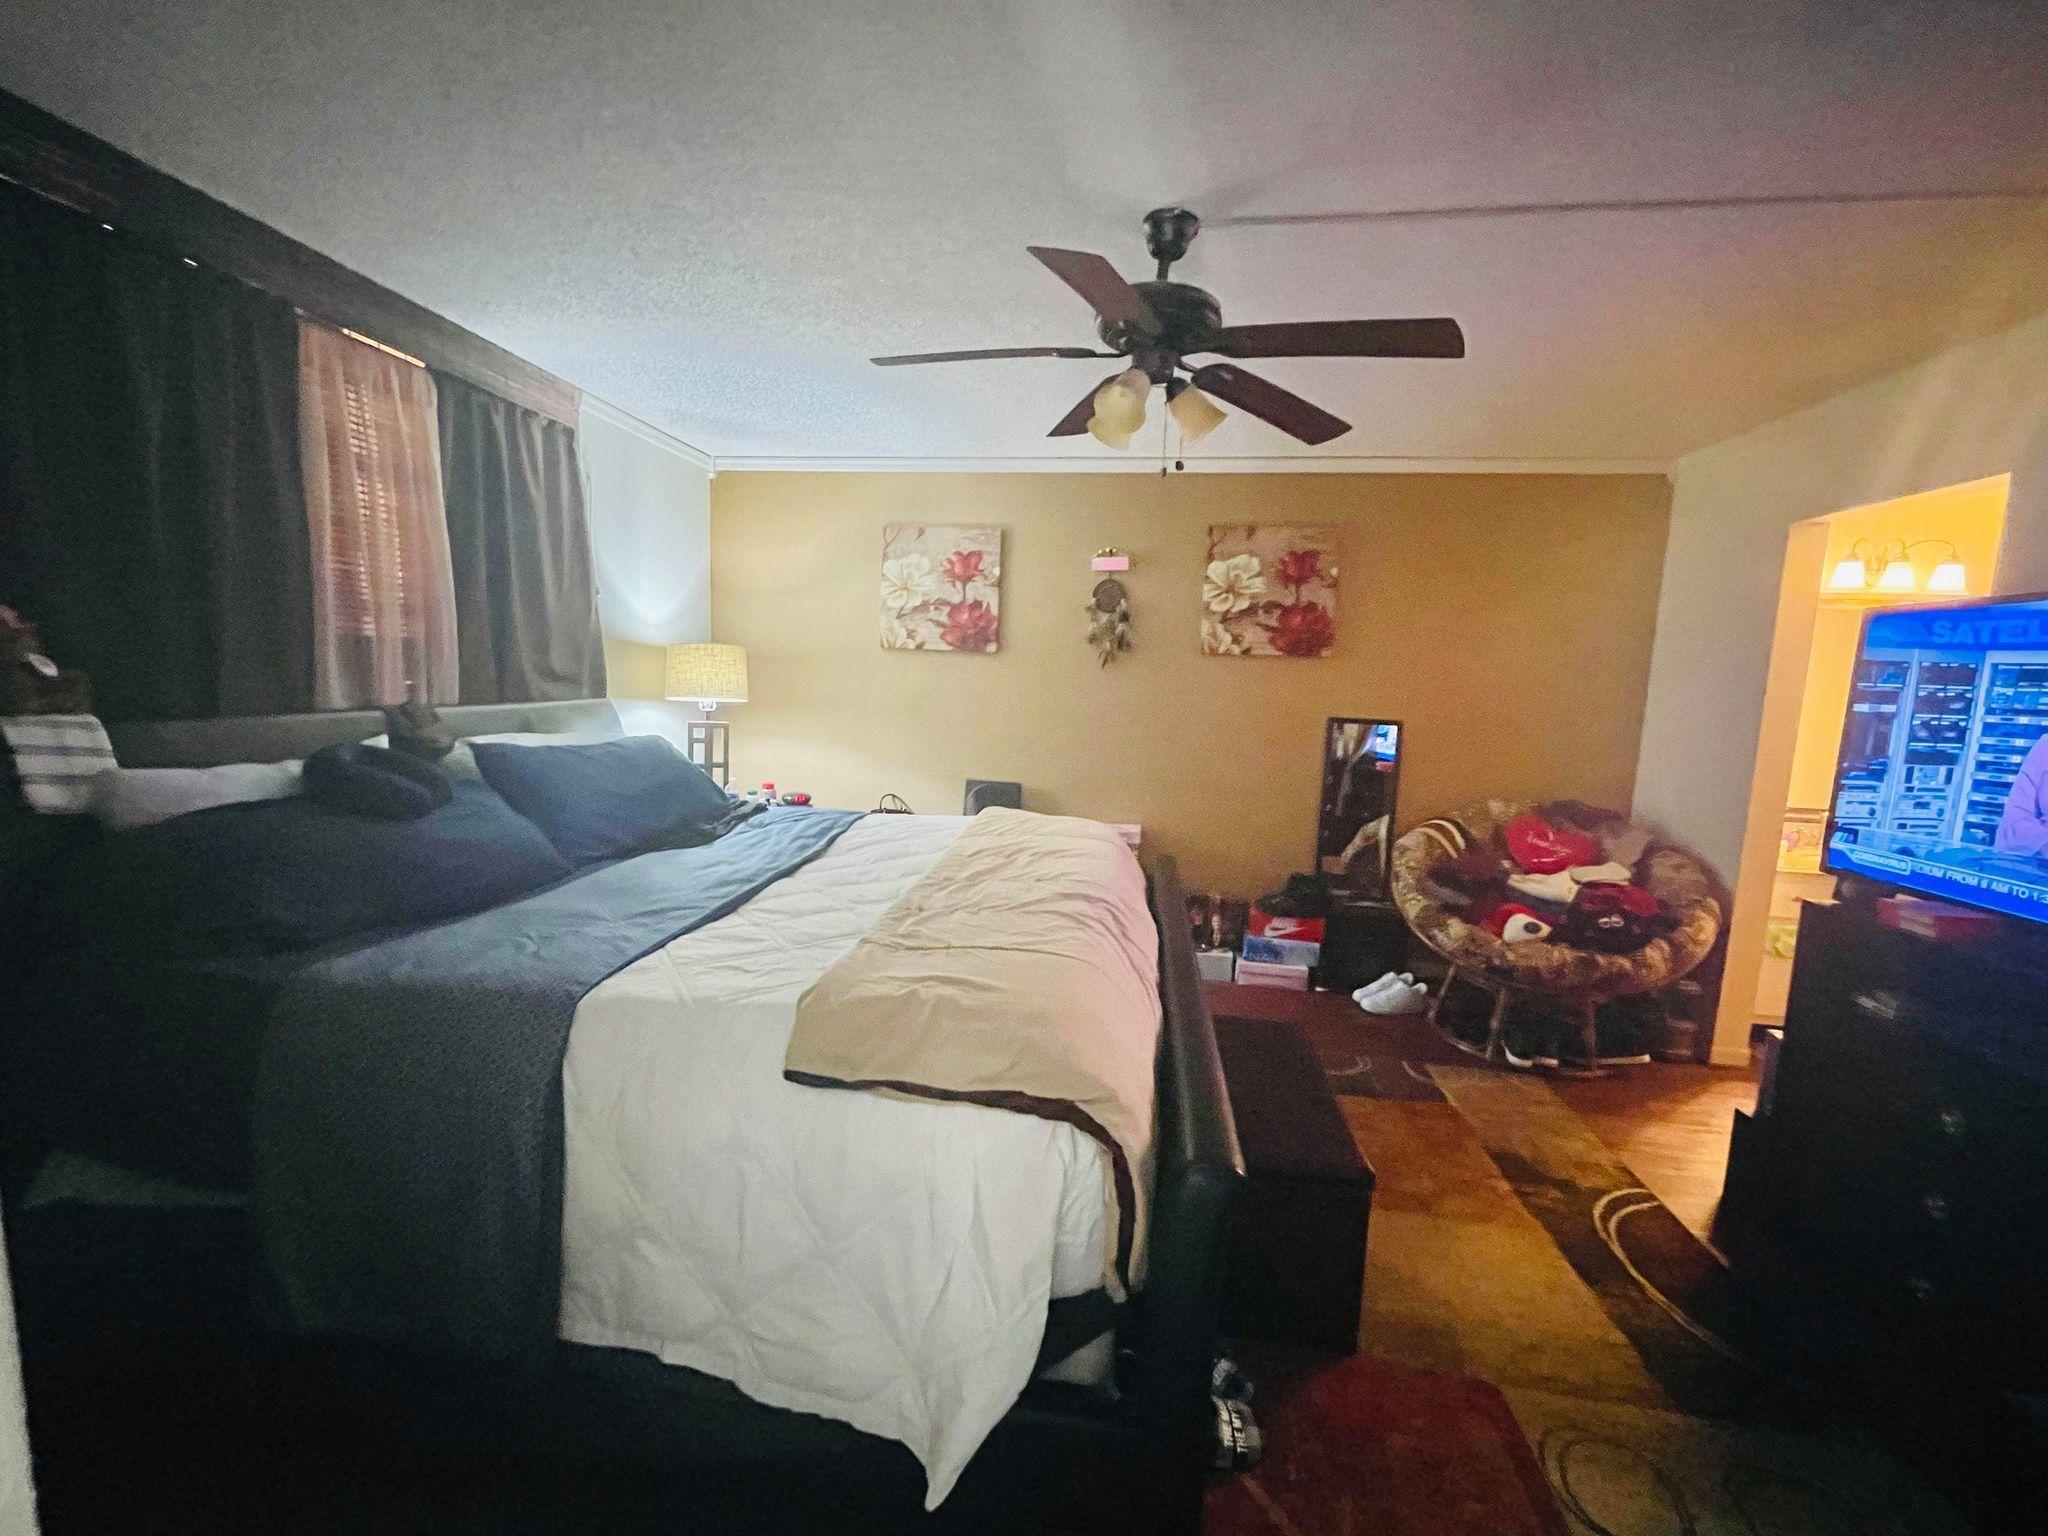 6575 Oakland Park Boulevard, Lauderhill, Florida 33313, 2 Bedrooms Bedrooms, ,2 BathroomsBathrooms,Residential,For Sale,Oakland Park,RX-10692597